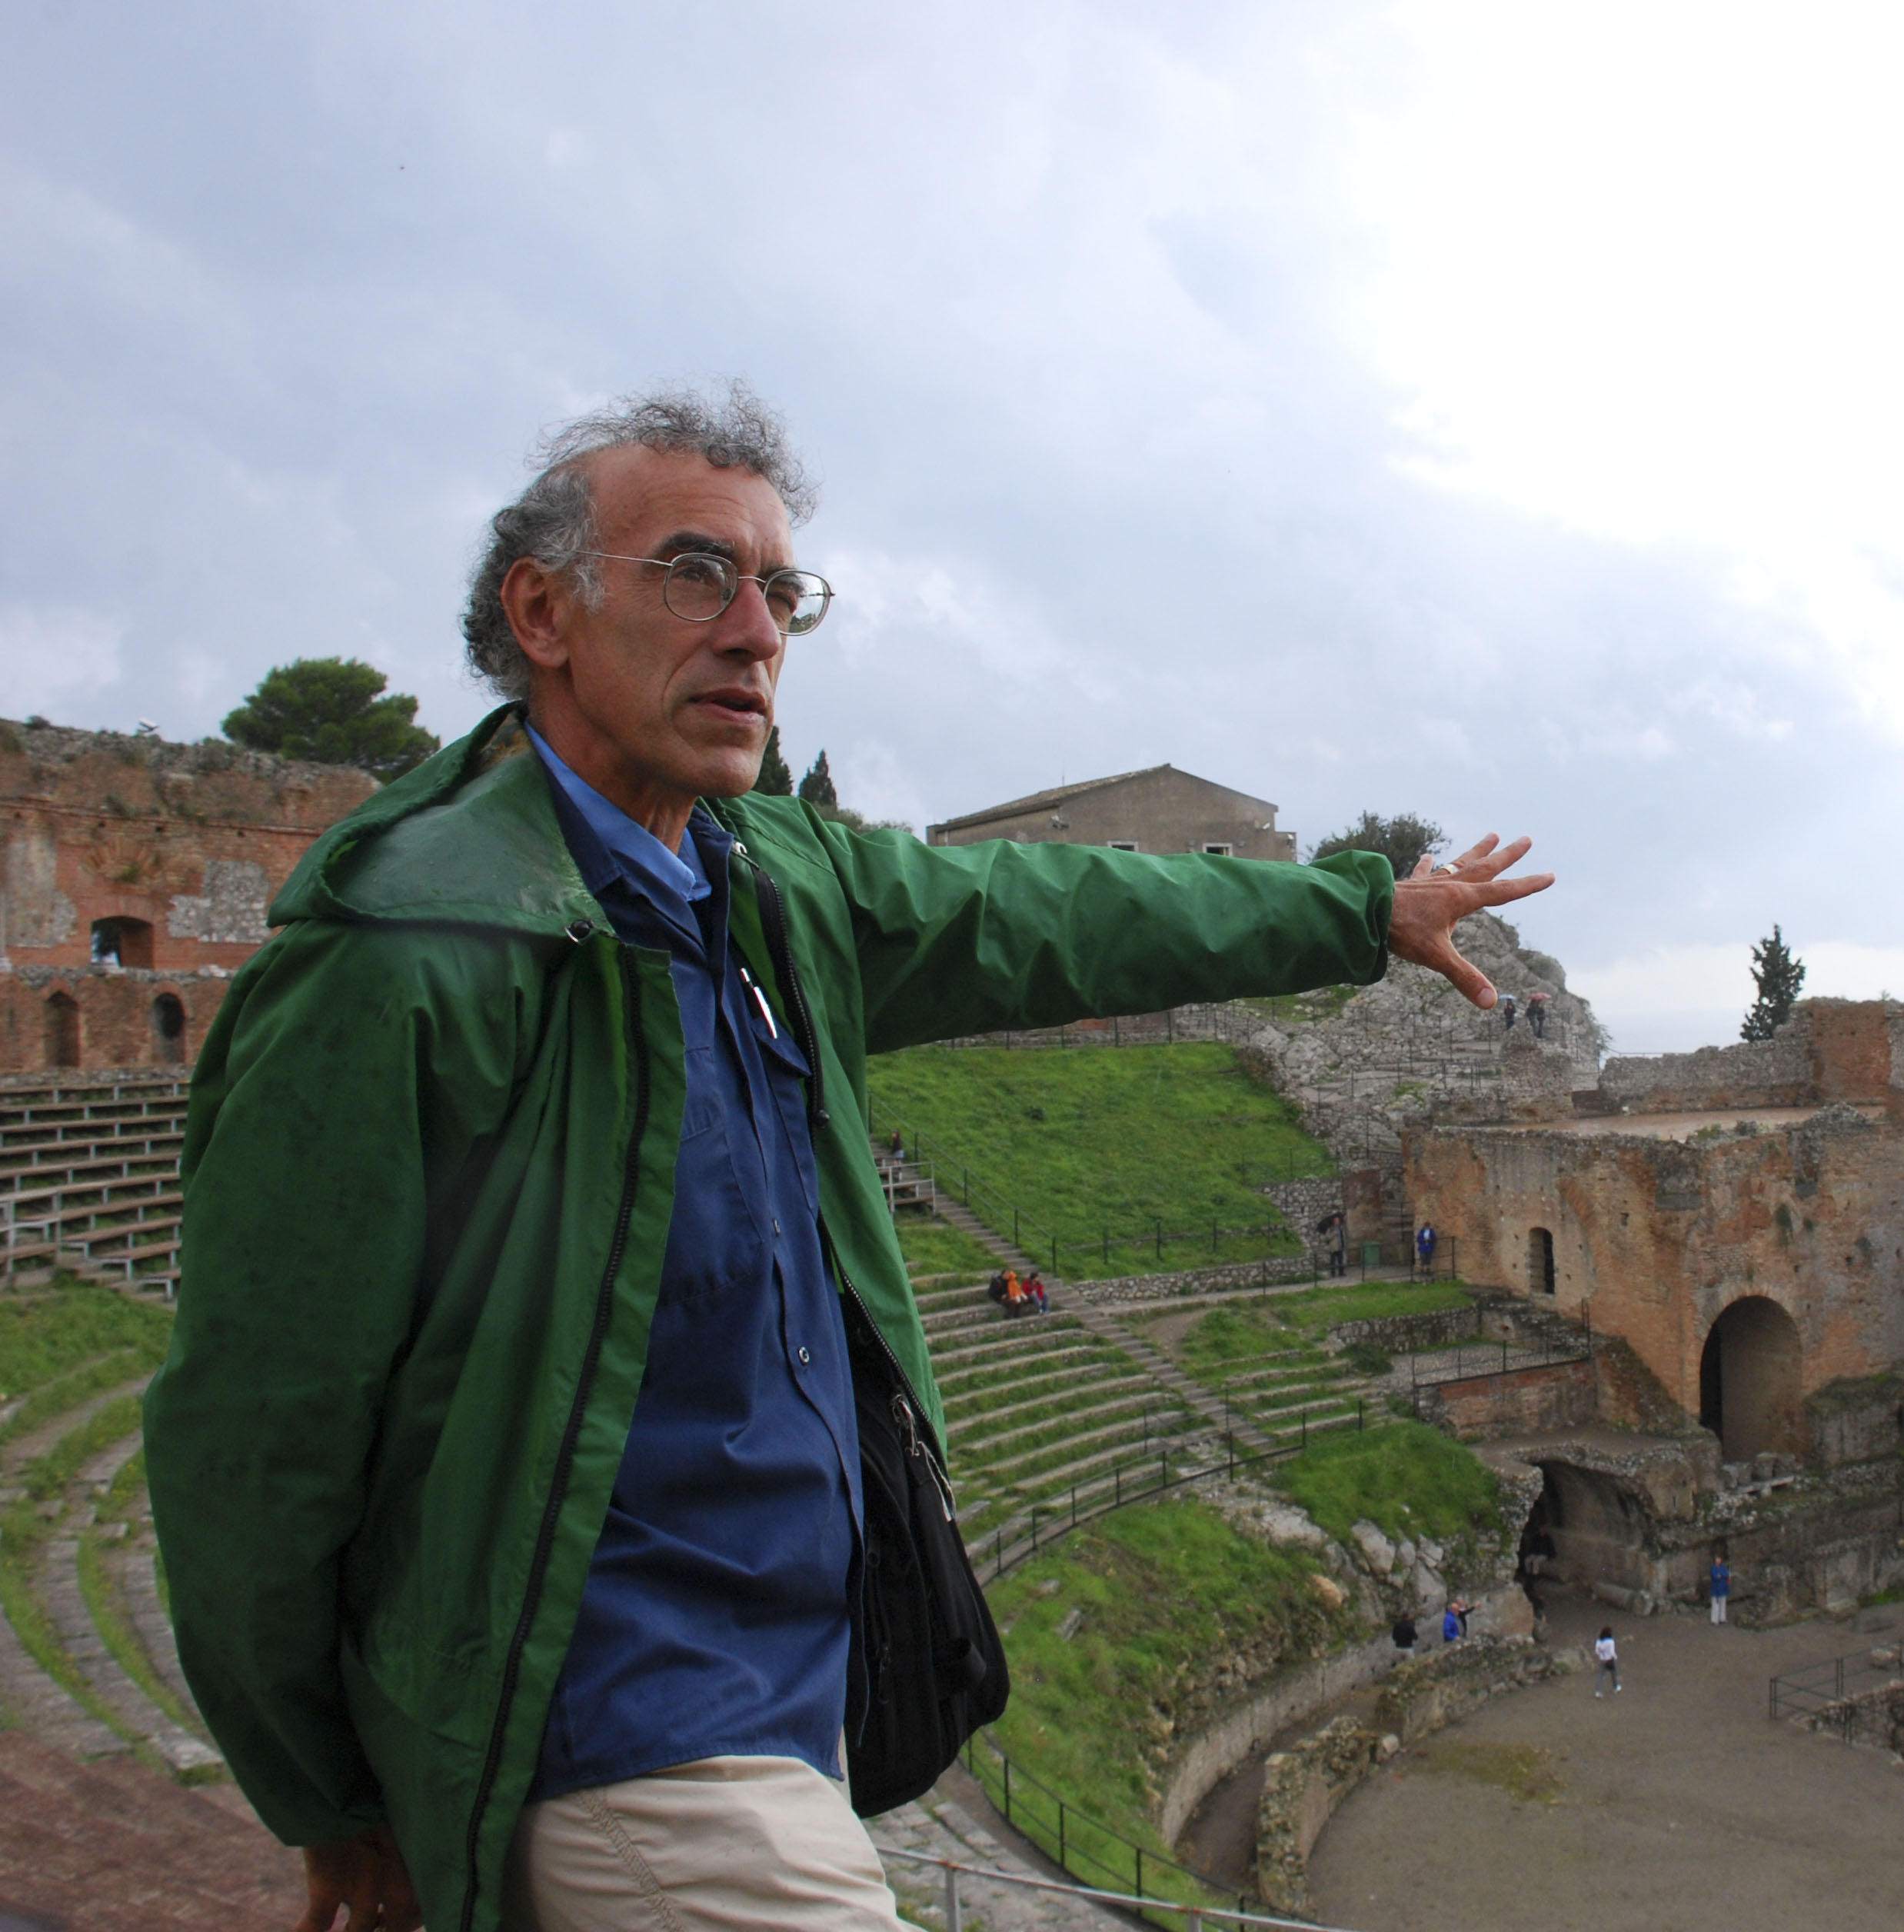 Douglas at the Roman Theatre of Taormina